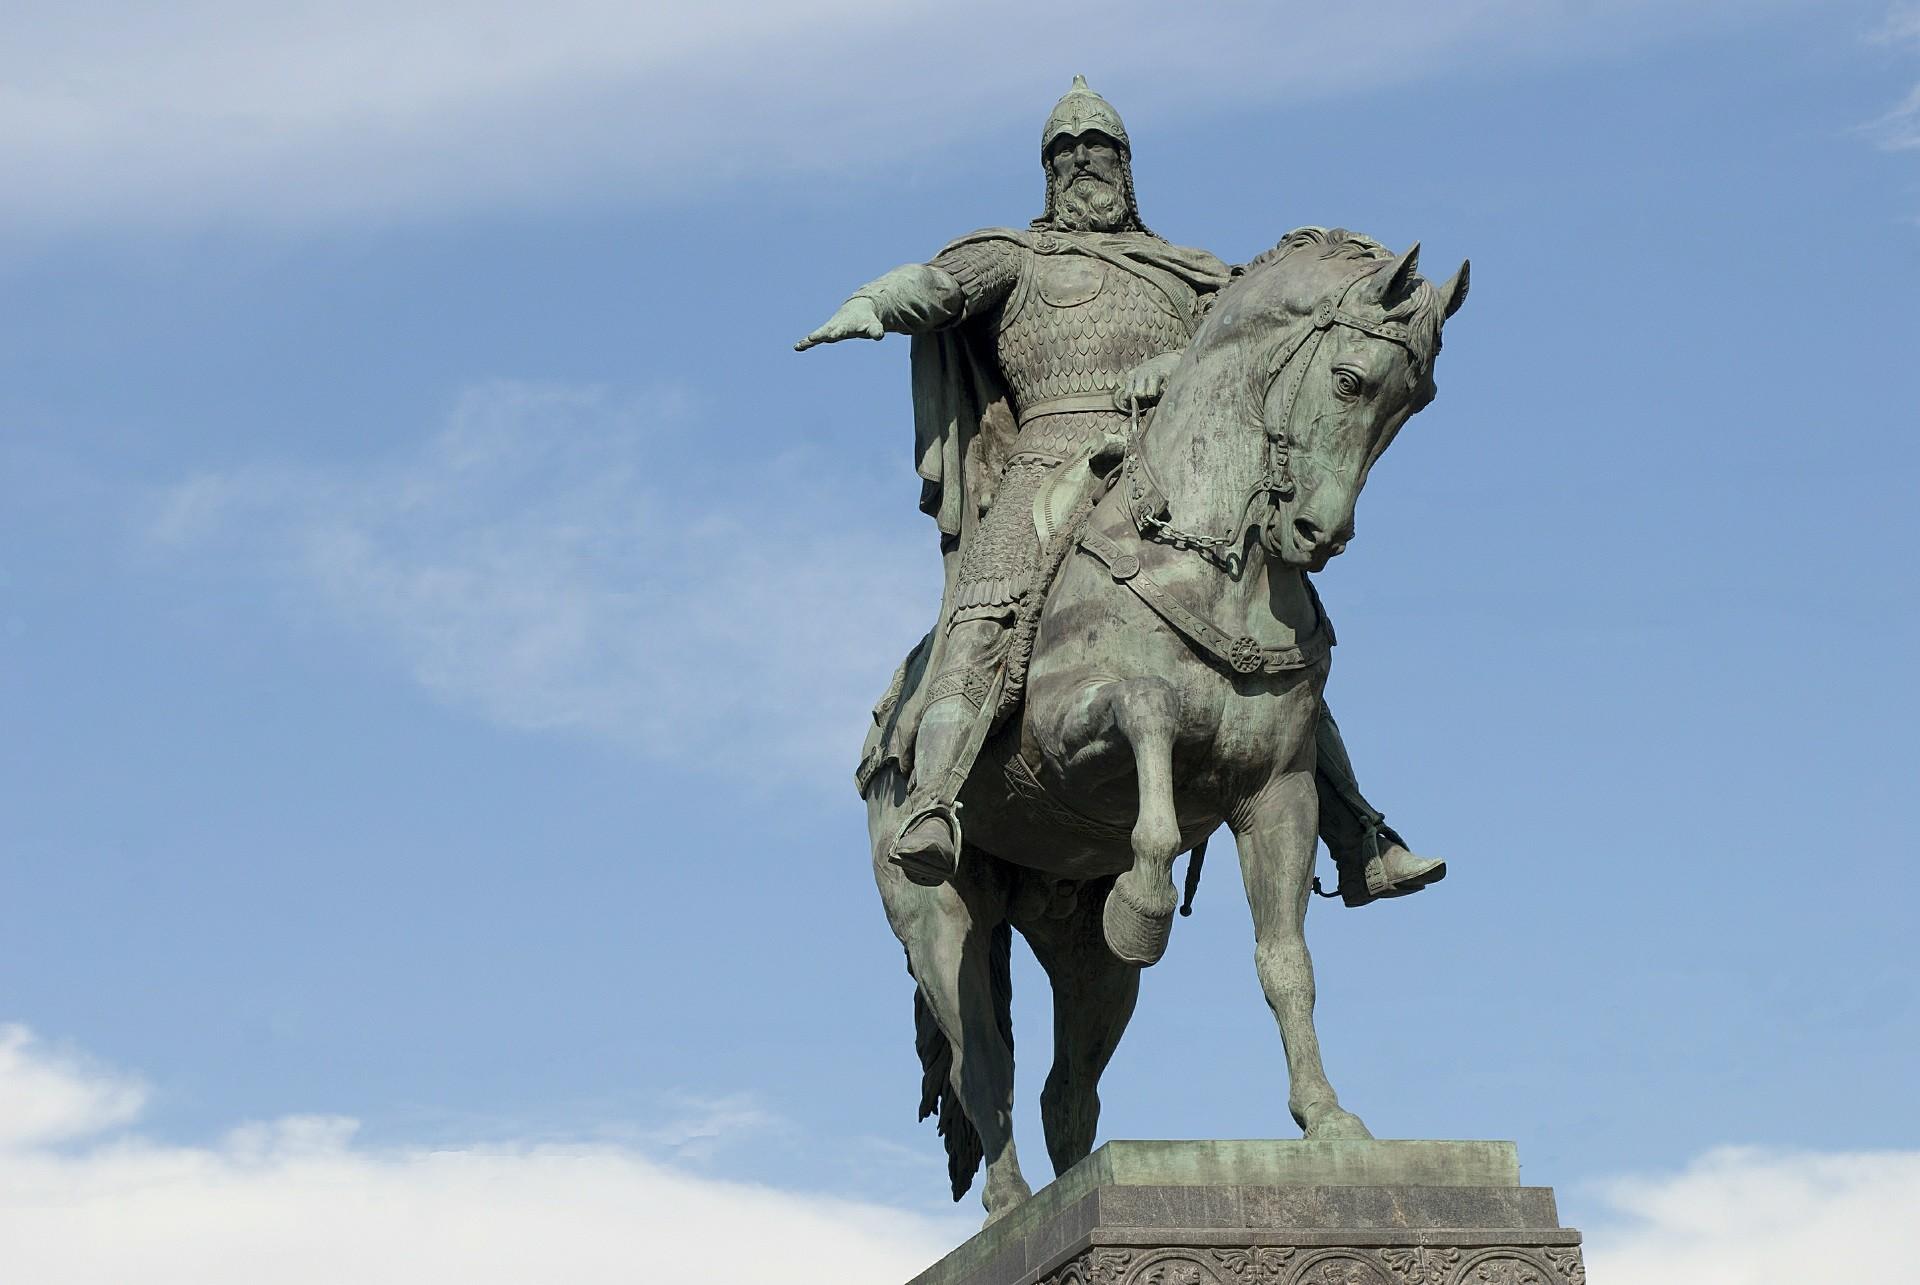 Monumento a Iúri Dolgorúki em Moscou.